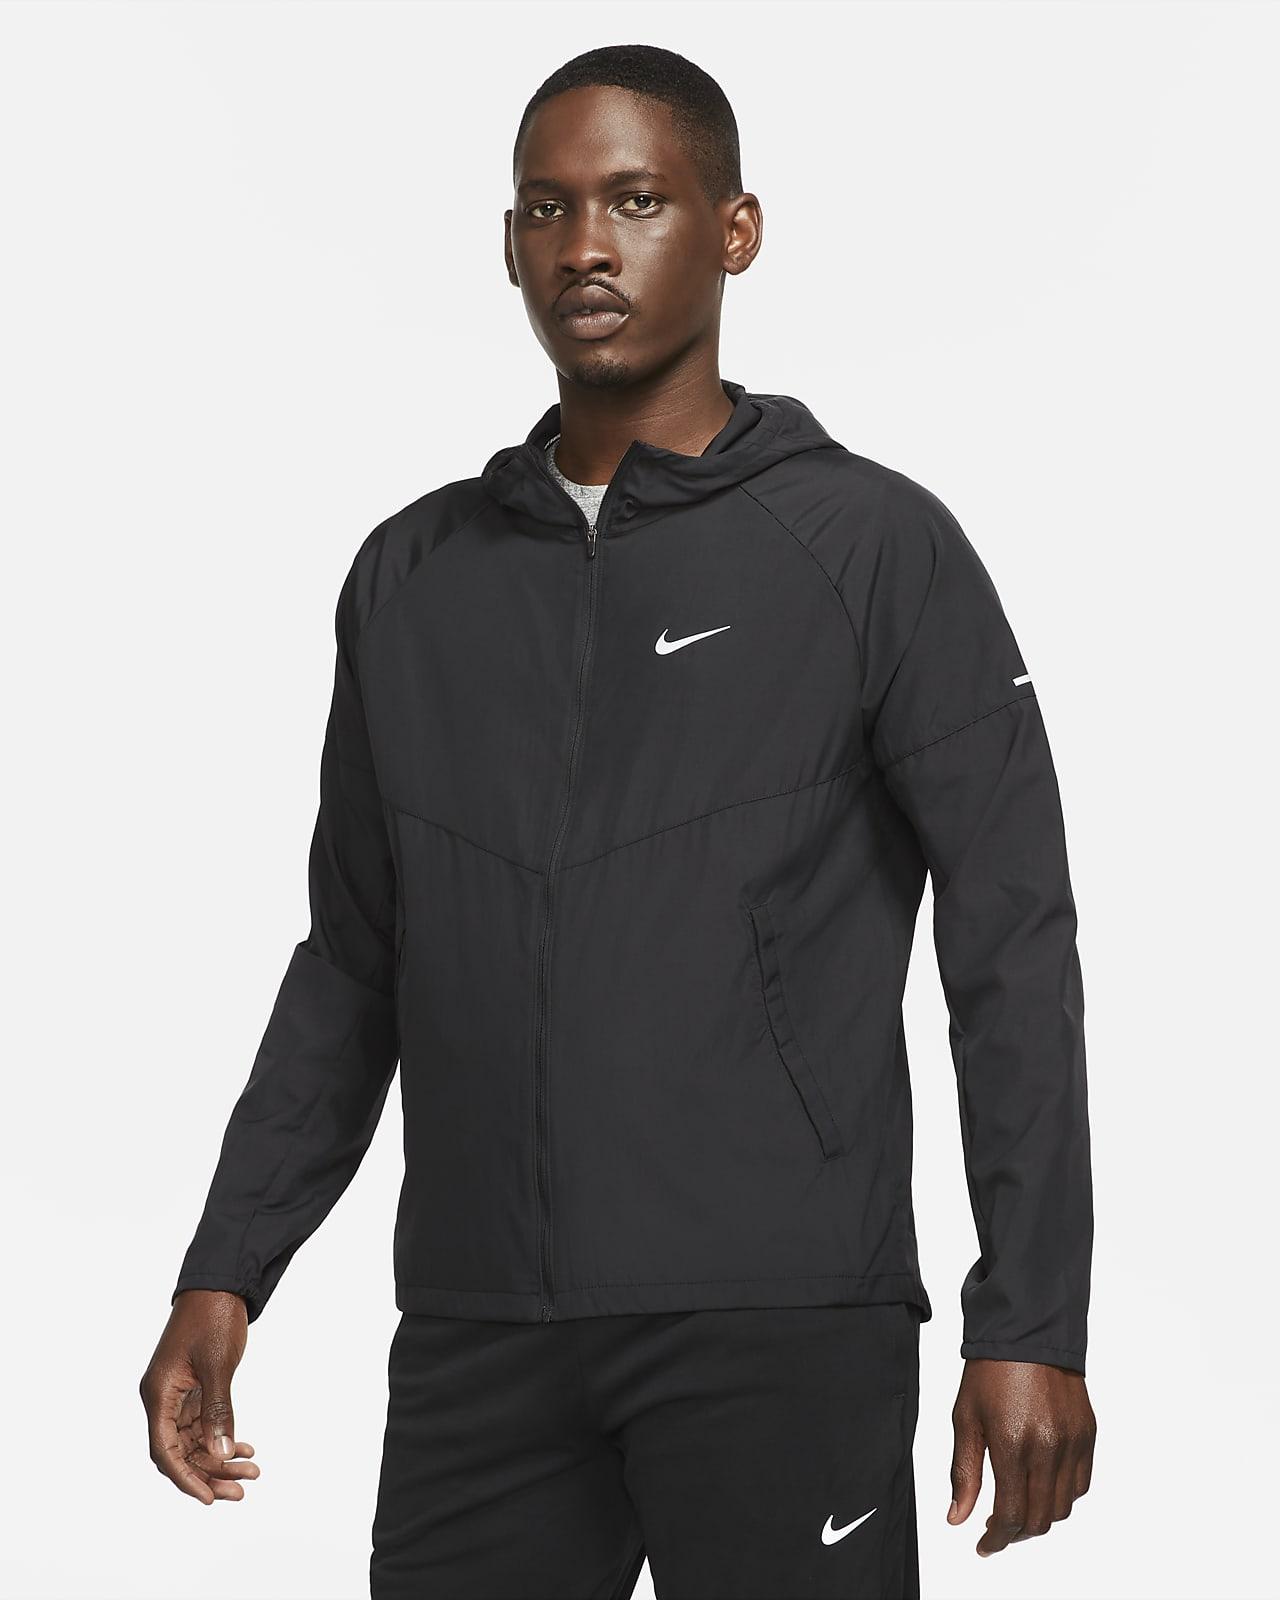 Giacca da running Nike Repel Miler - Uomo